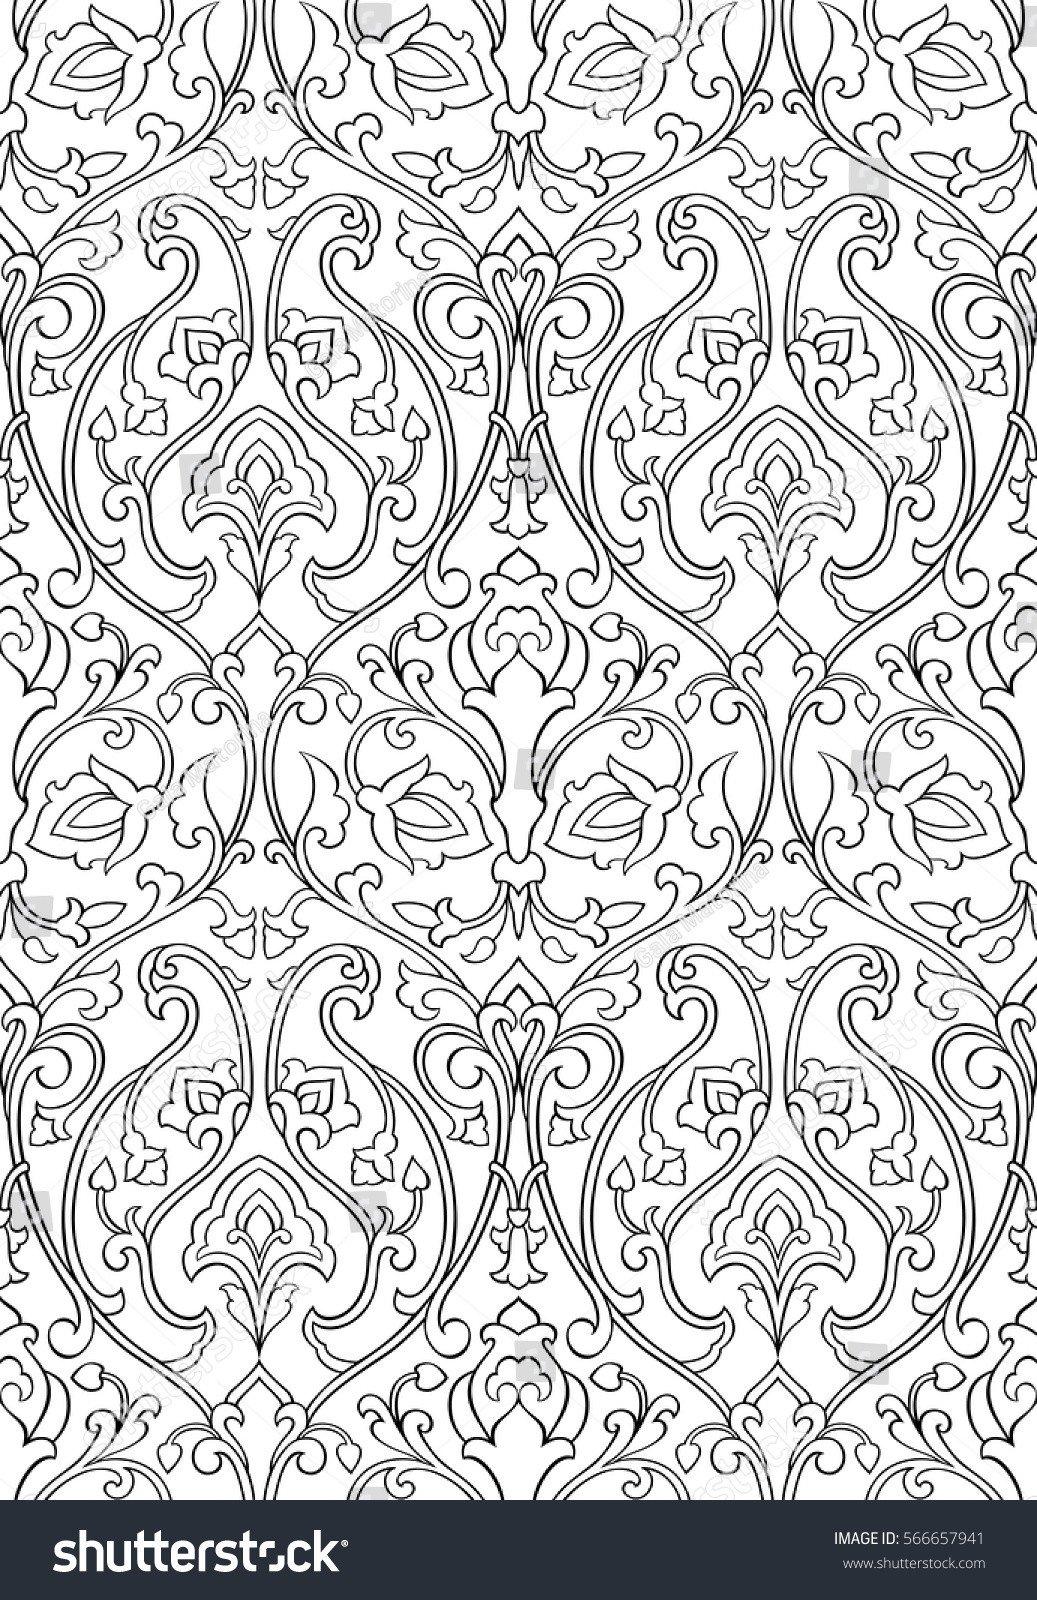 Filigree Design Templates Black White Floral Pattern Seamless Filigree Stock Vector